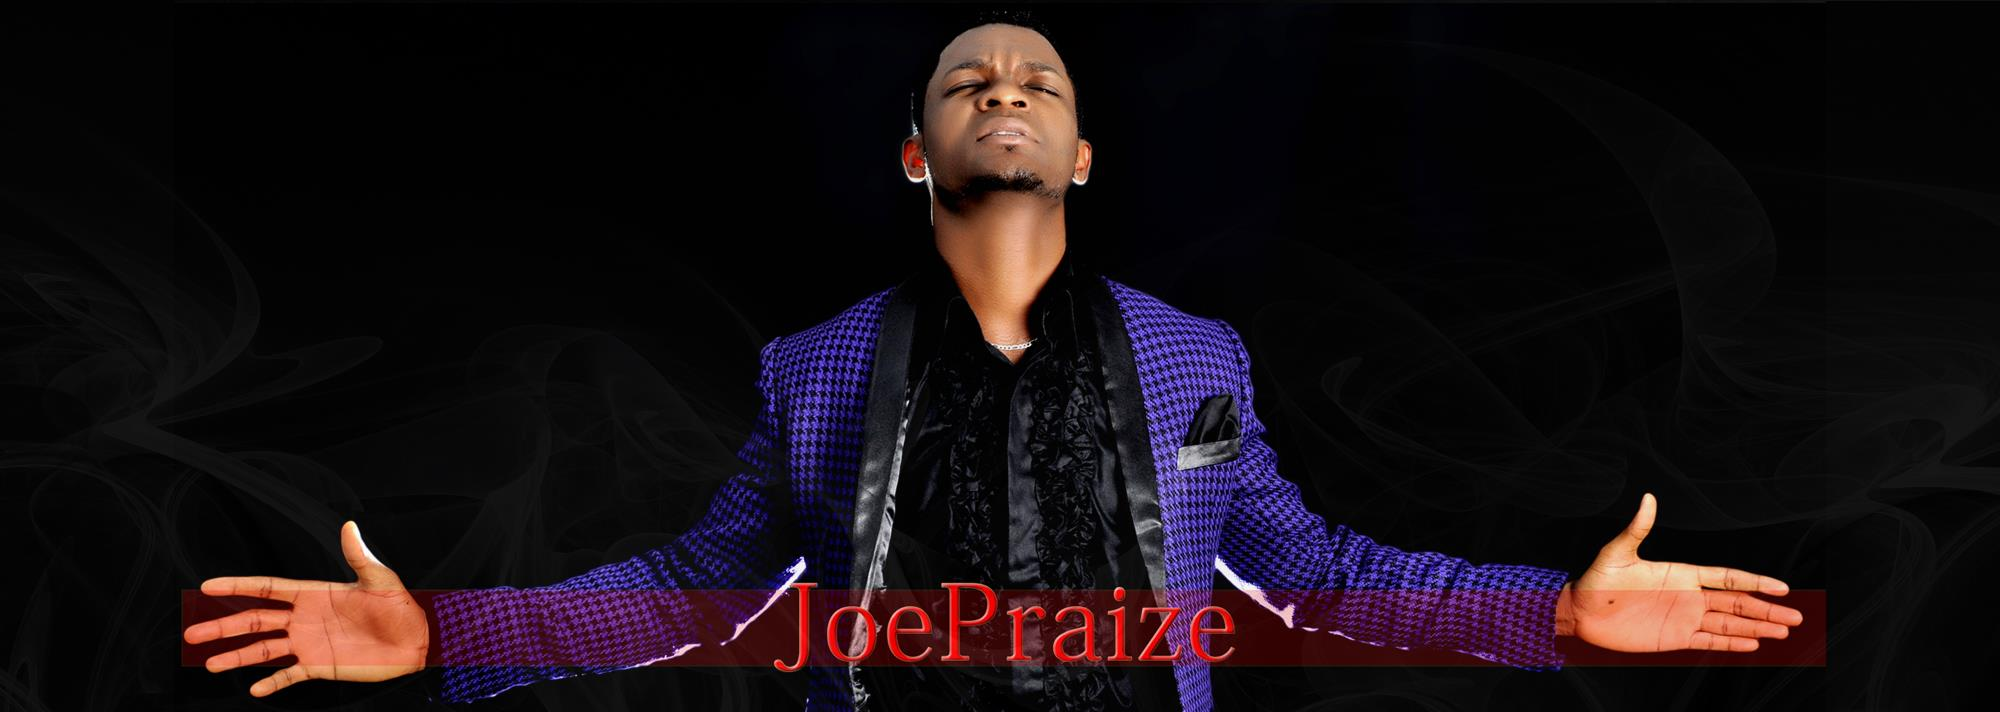 Joepraize